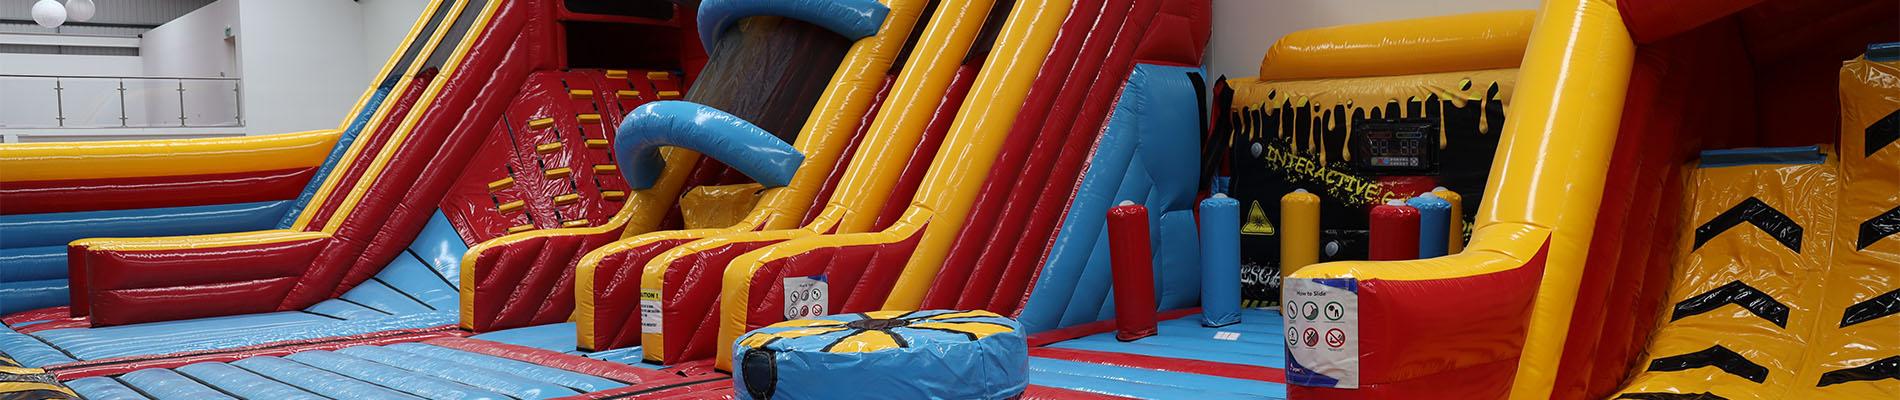 Parcs gonflables XXL airparx inflatables